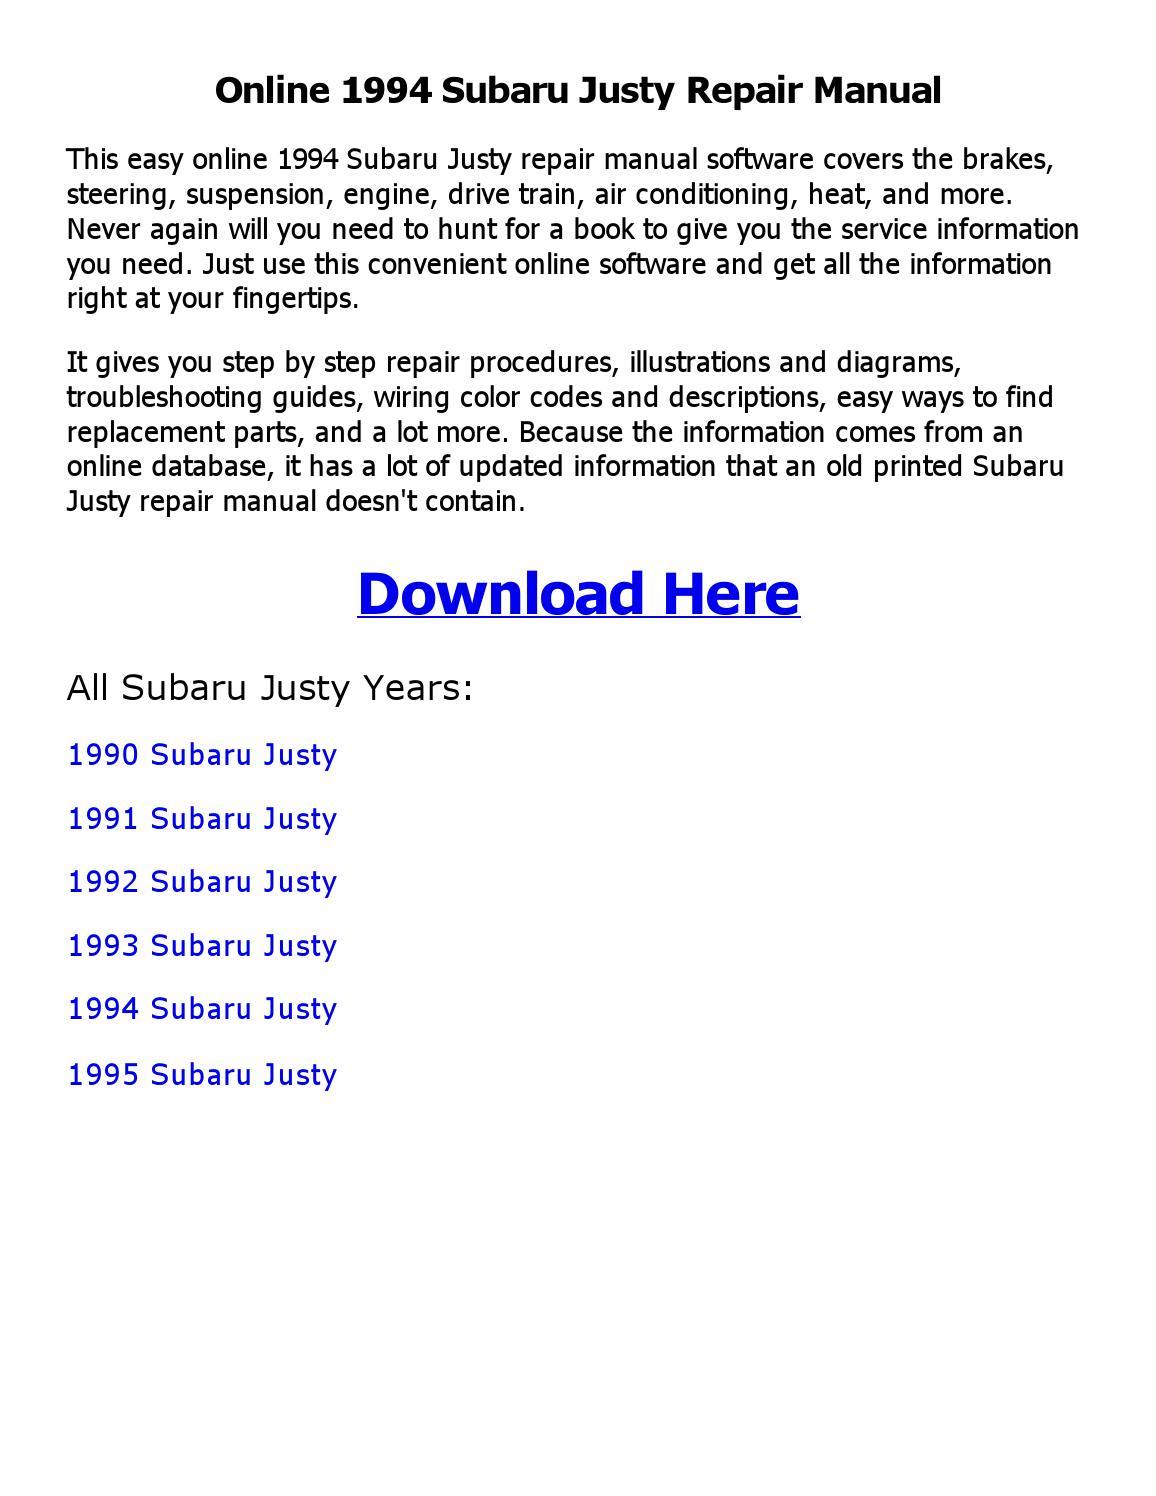 1994 Subaru Justy Repair Manual Online By Sanod Saha Issuu 1992 Engine